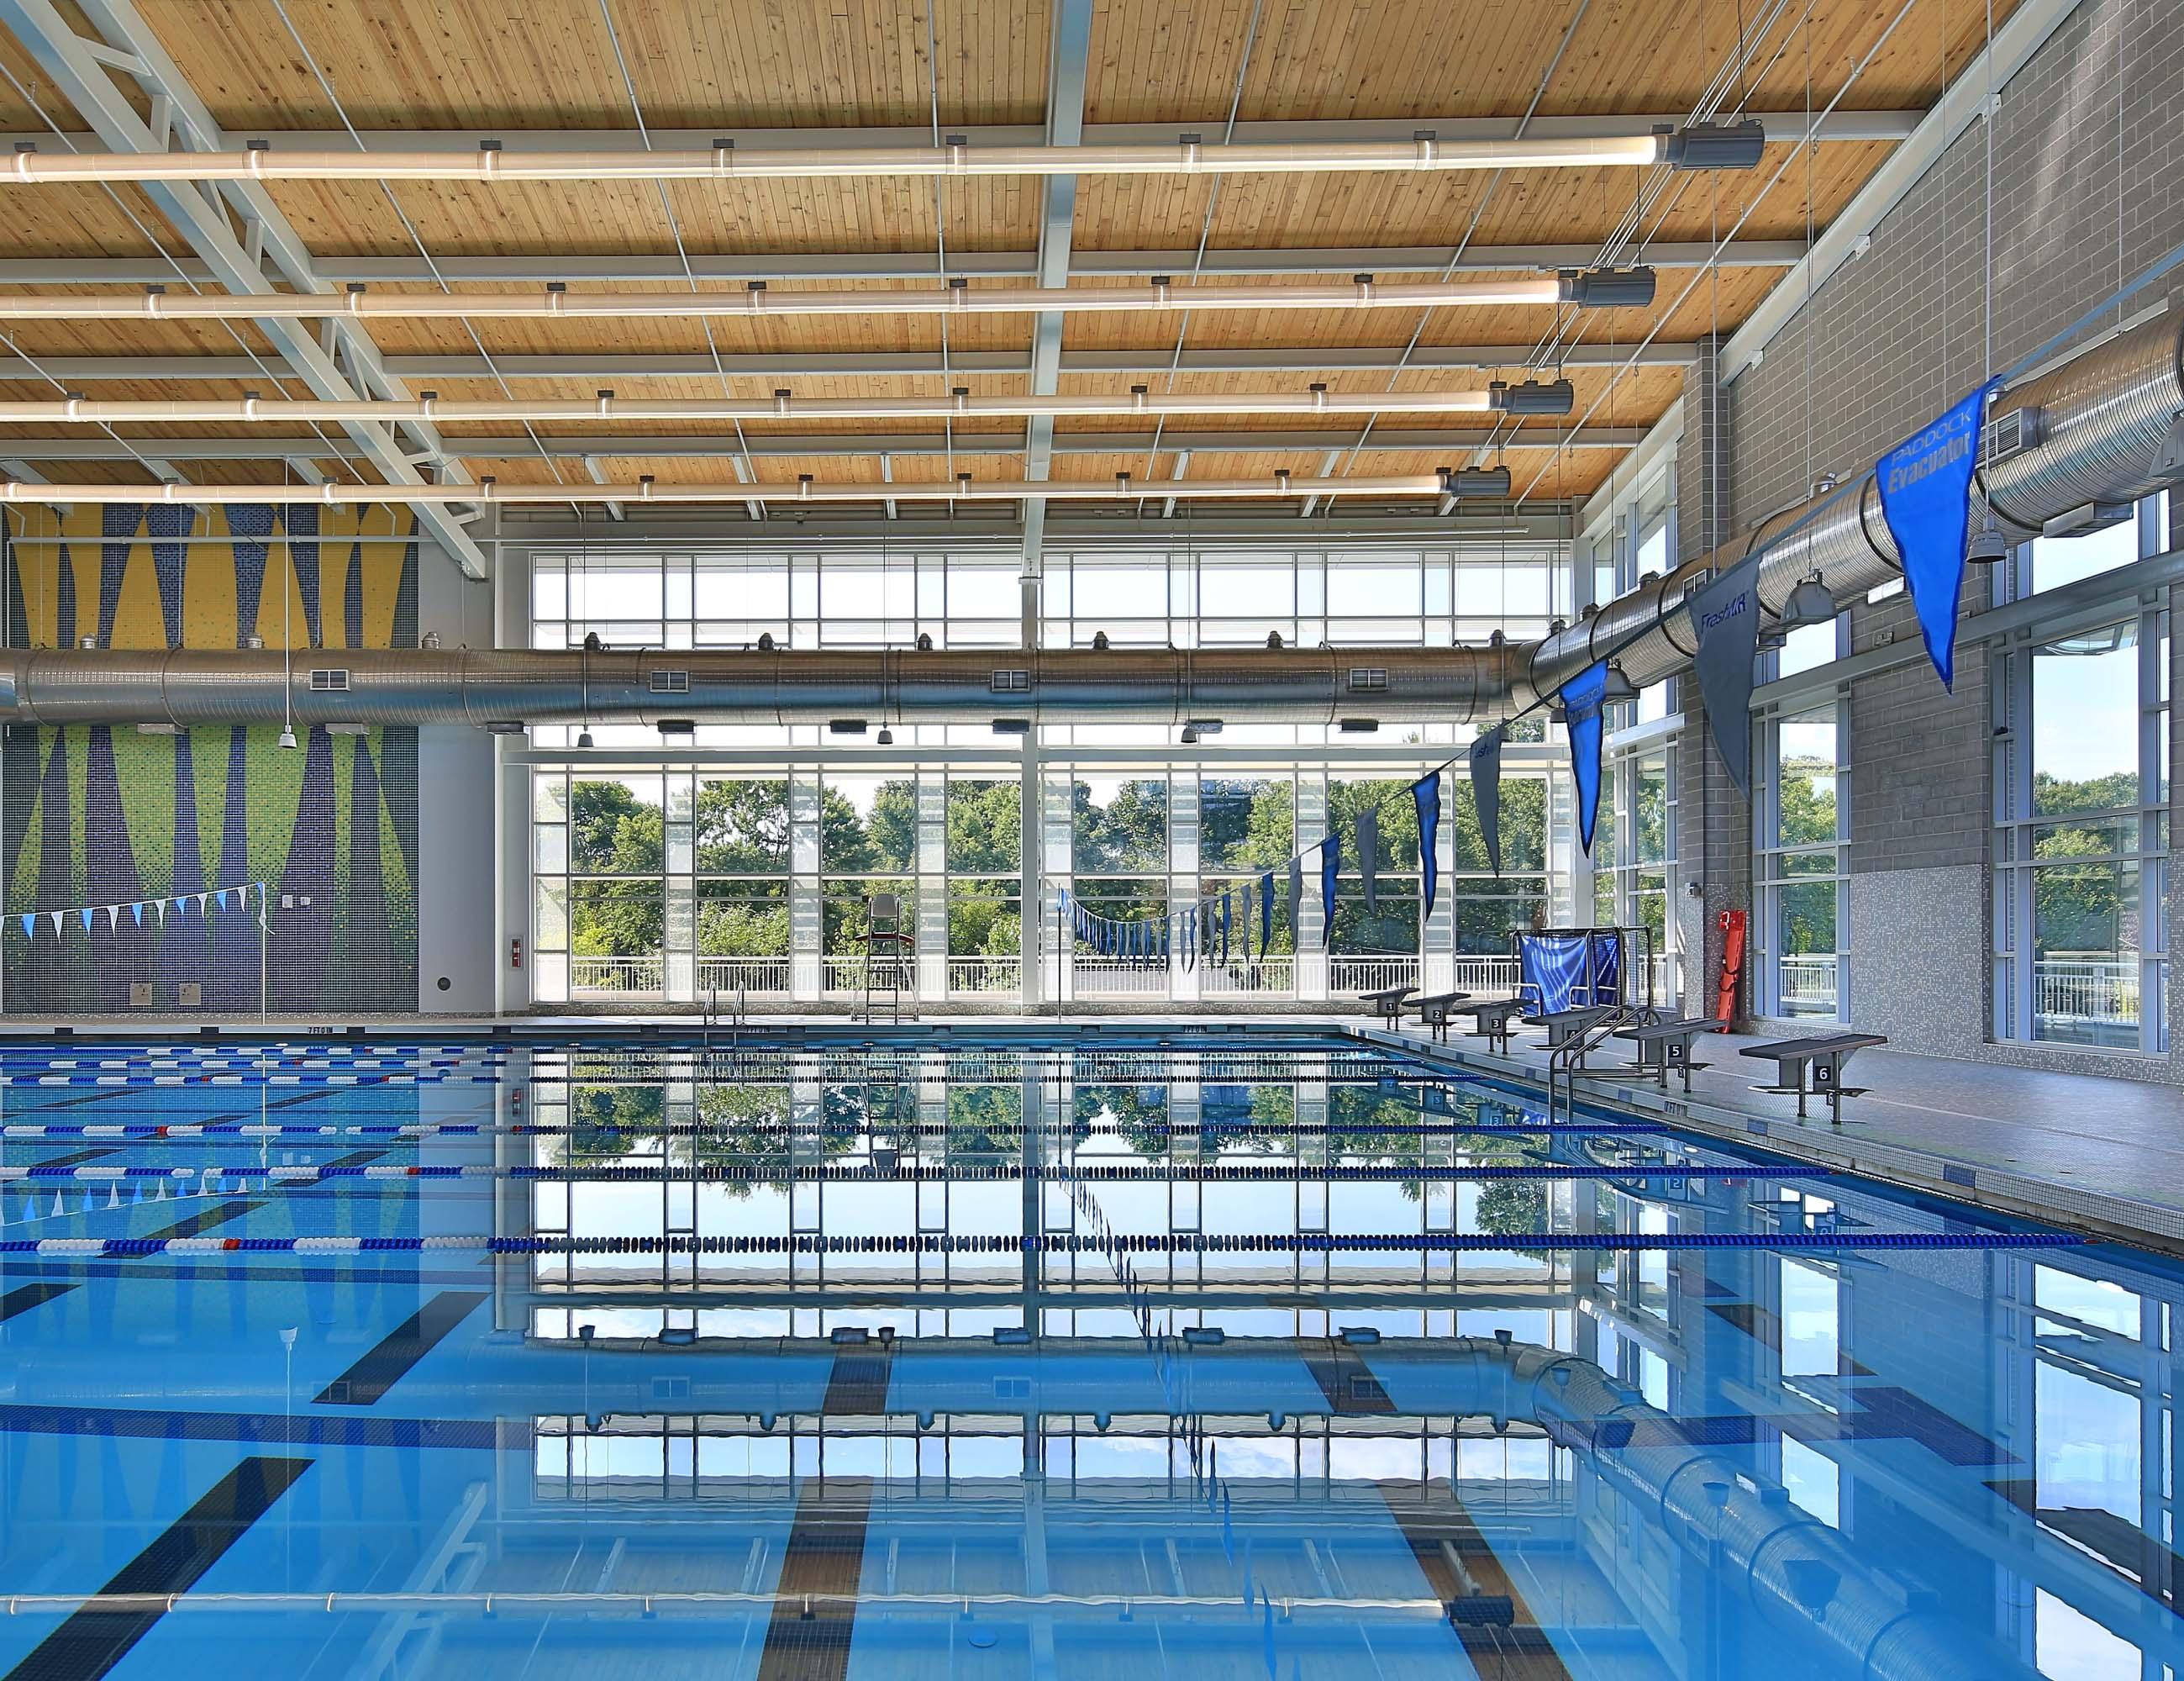 uncg-leonard-ctr-for-wellness_jimsink-pool-a_2